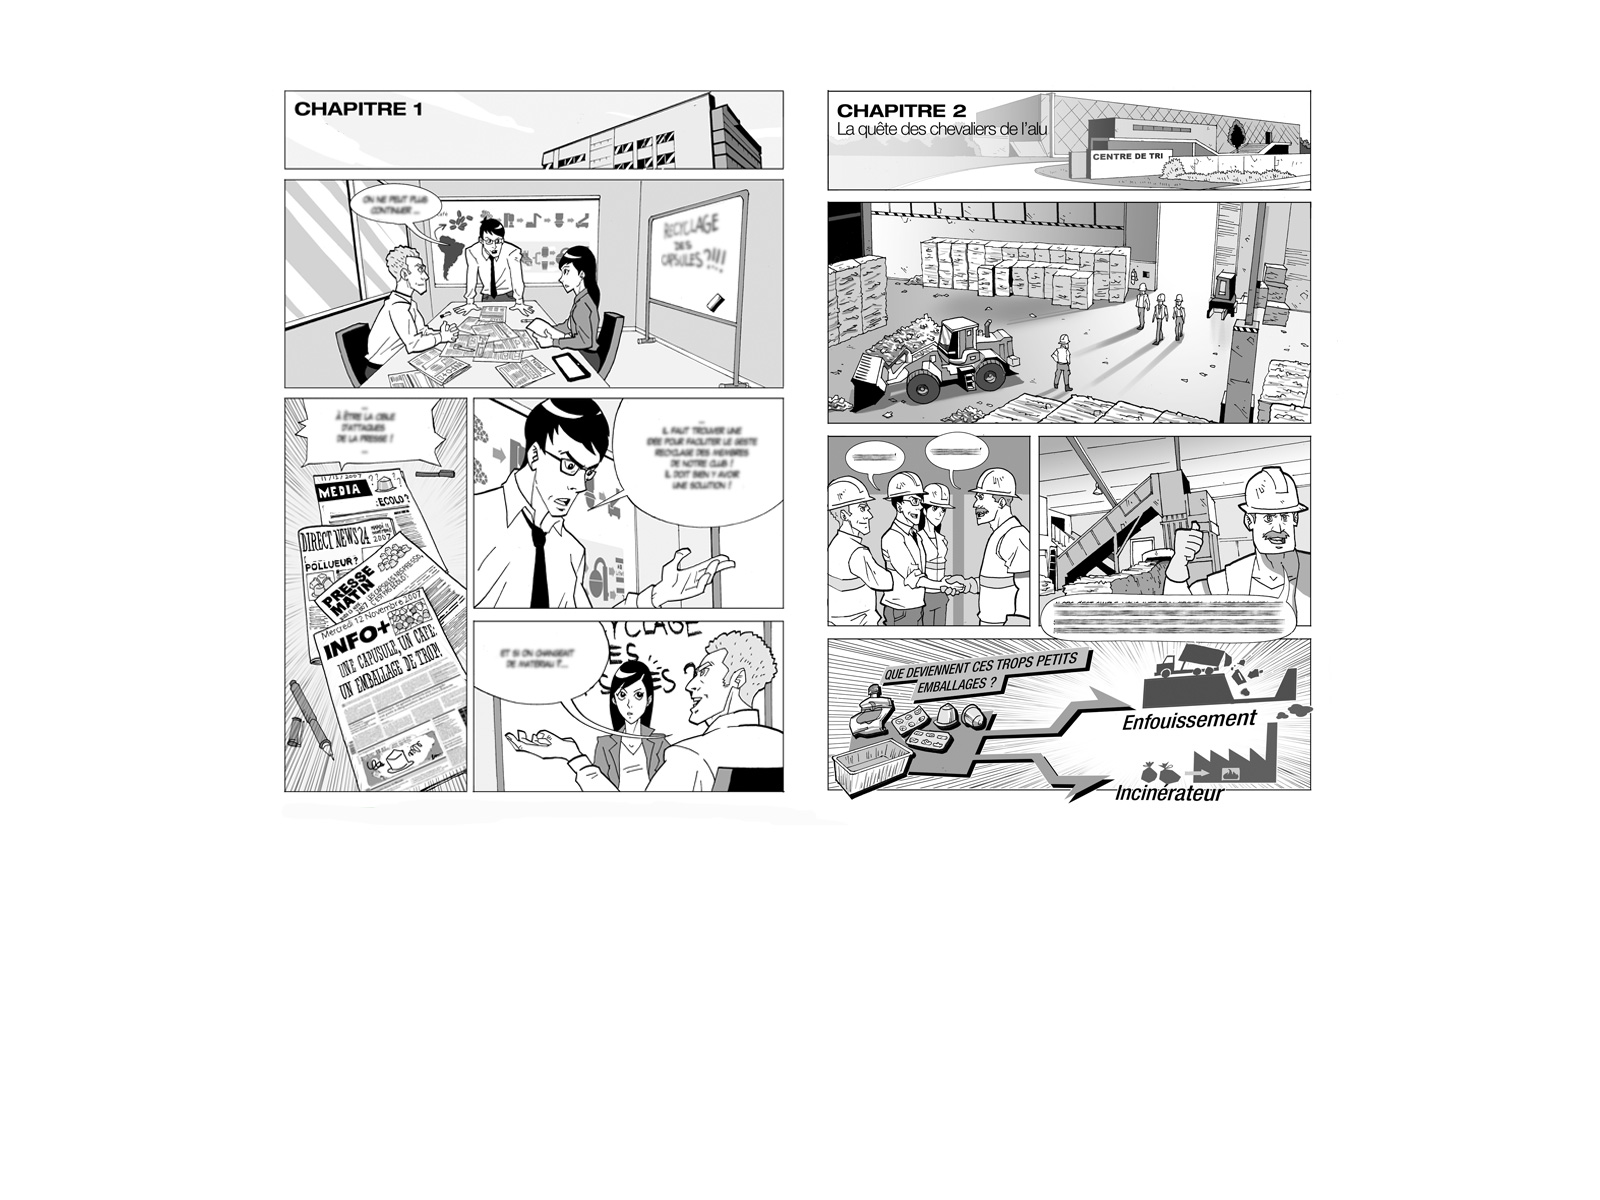 illustrations-alfonsorecio-7069